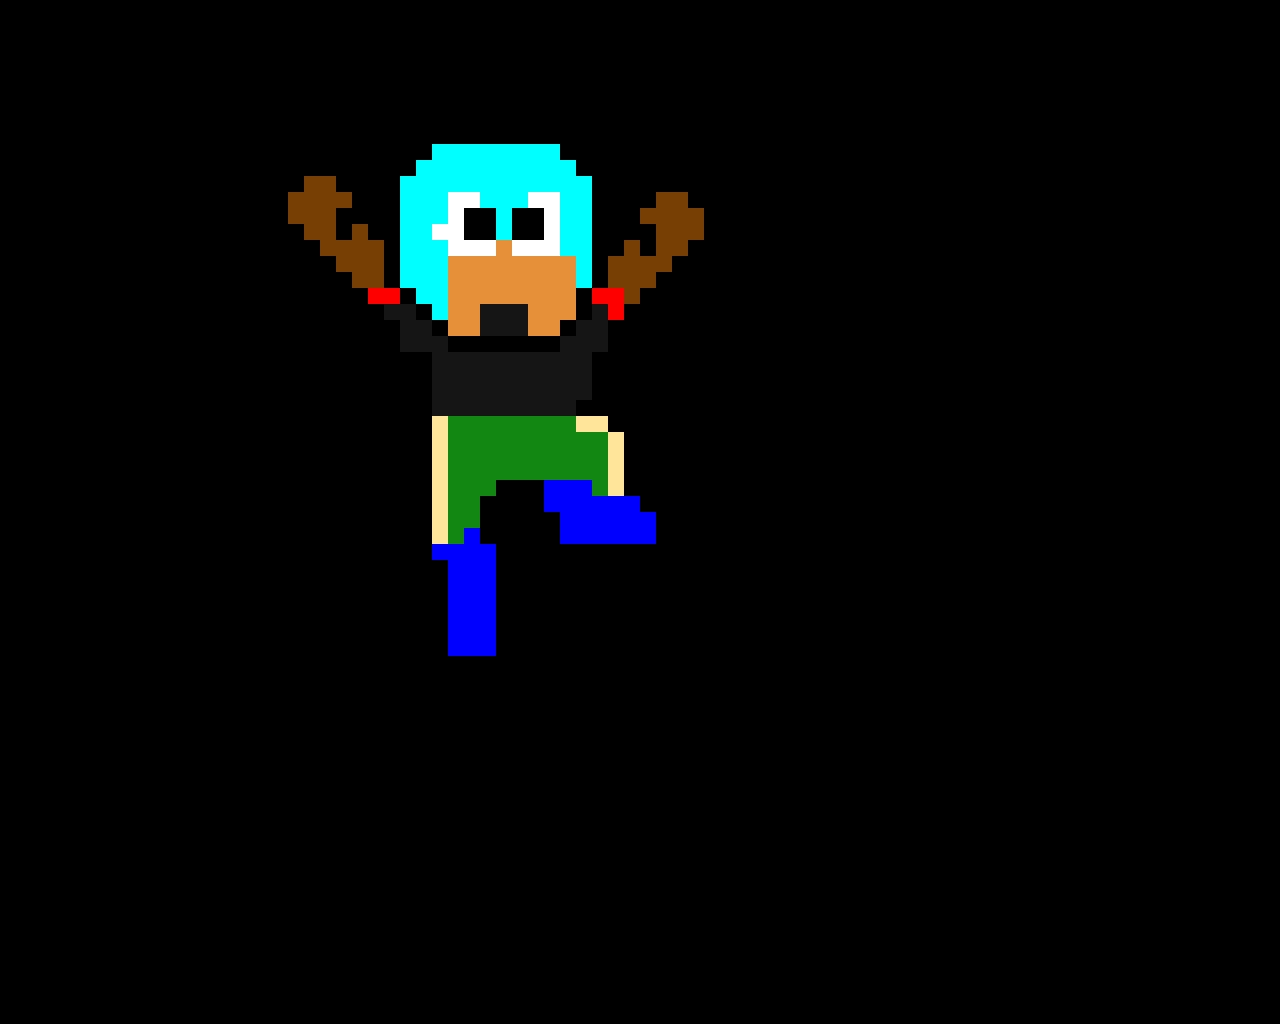 Me (Jumping sprite)